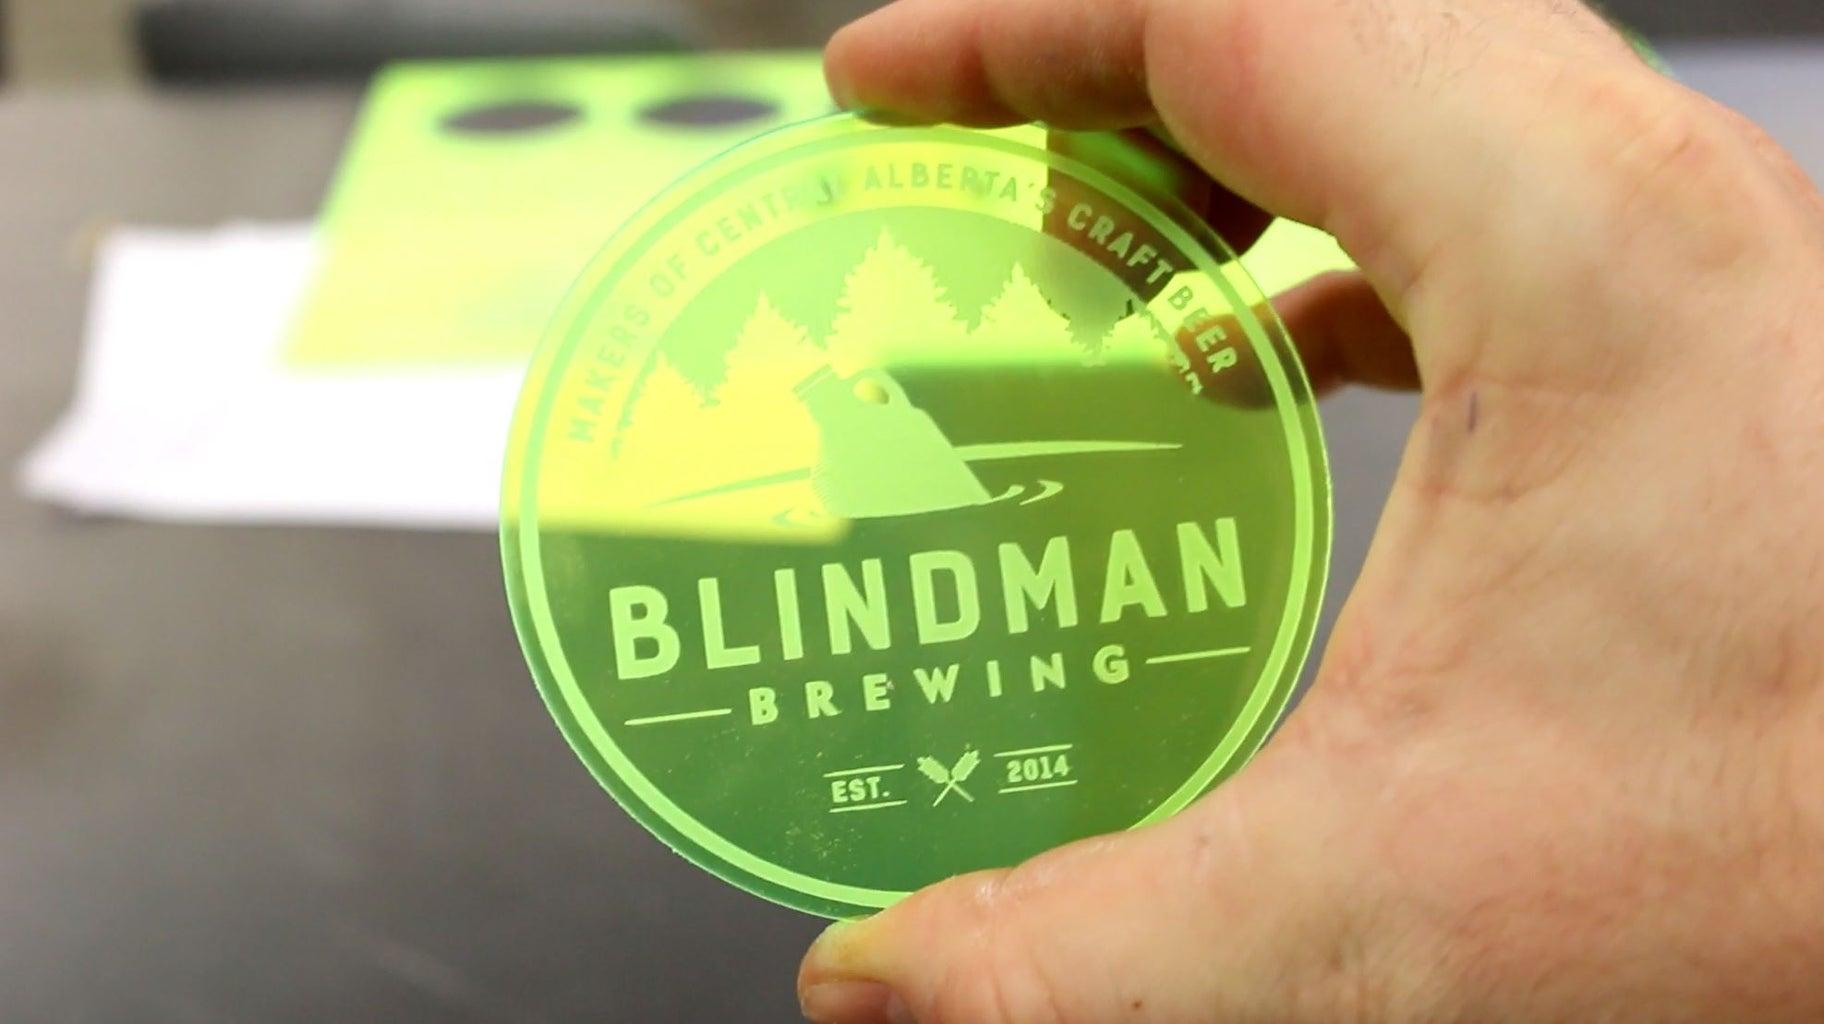 Coaster 3: Blindman Brewing